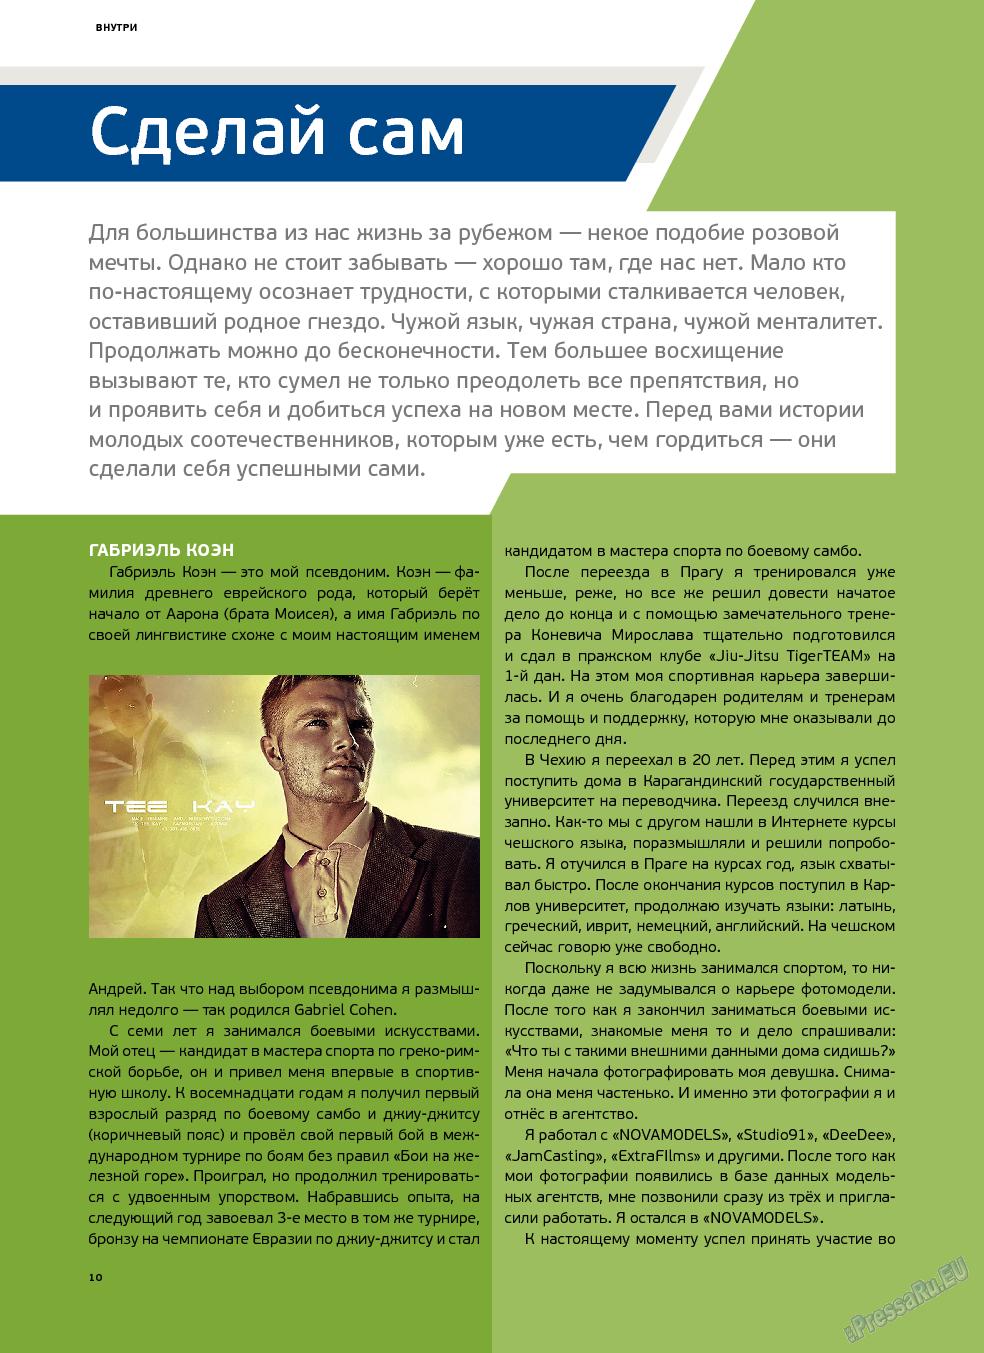 Артек (журнал). 2013 год, номер 2, стр. 12